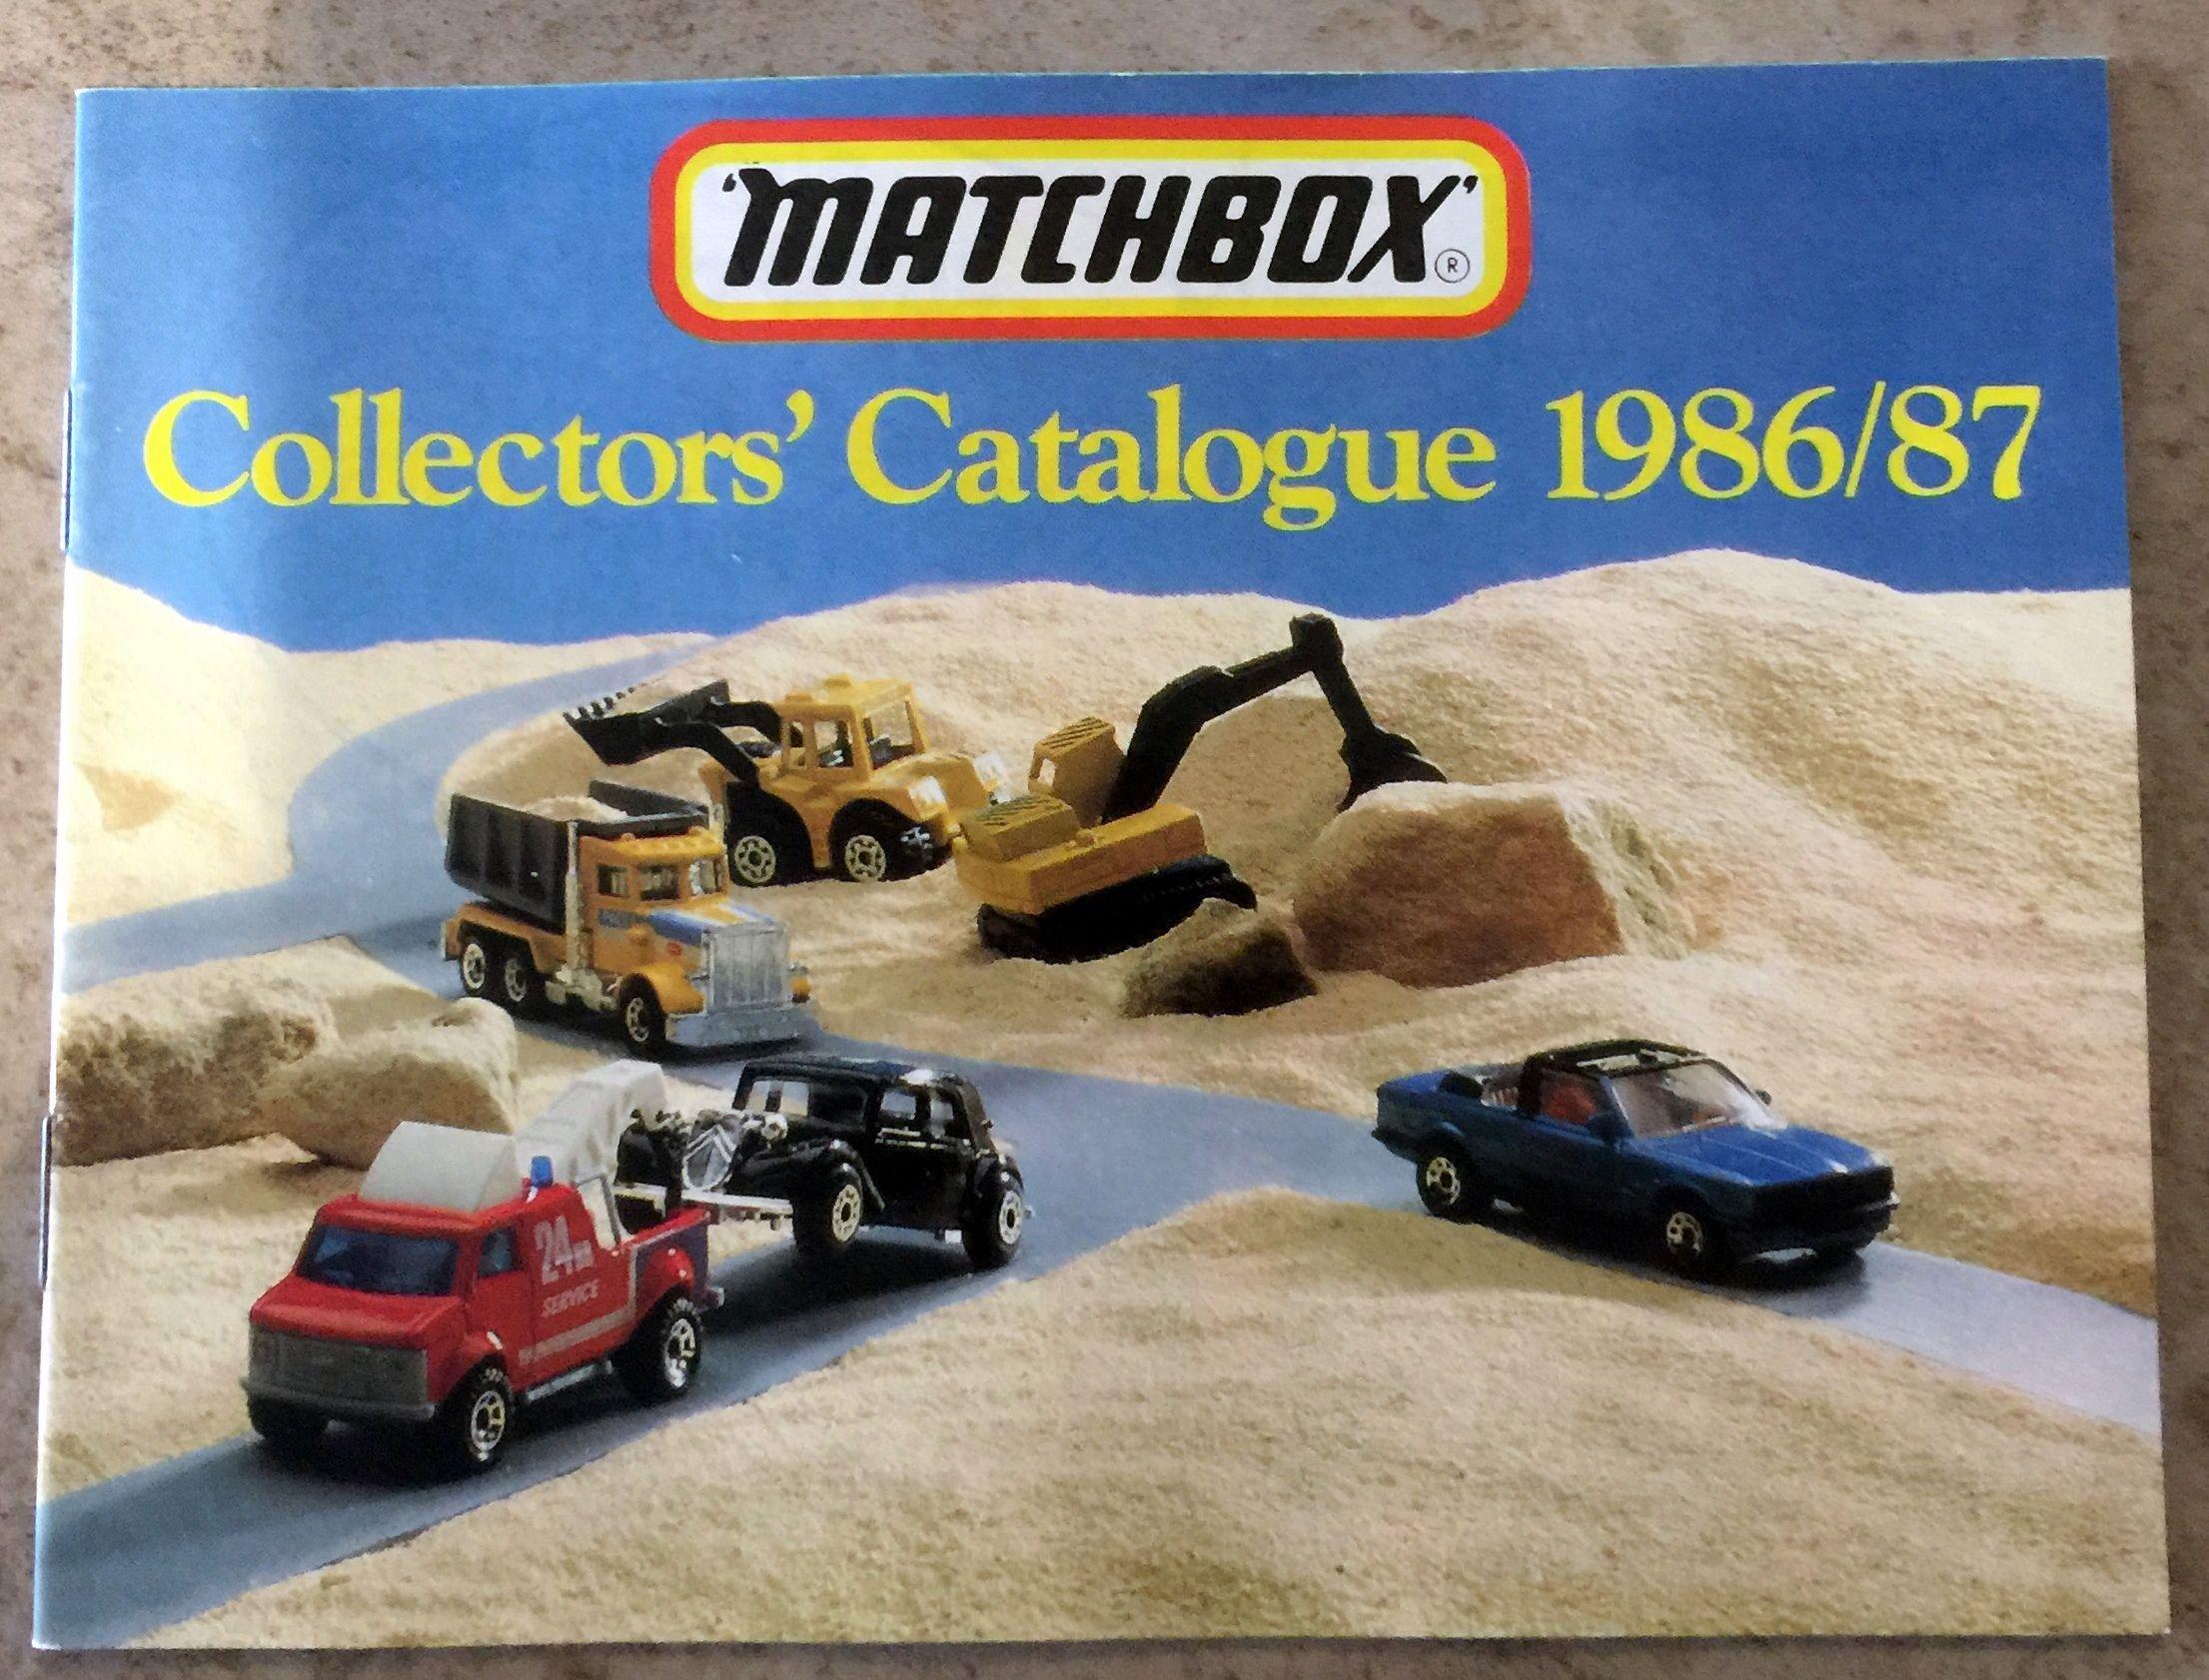 1986/87 Matchbox Collectors' Catalogue front cover